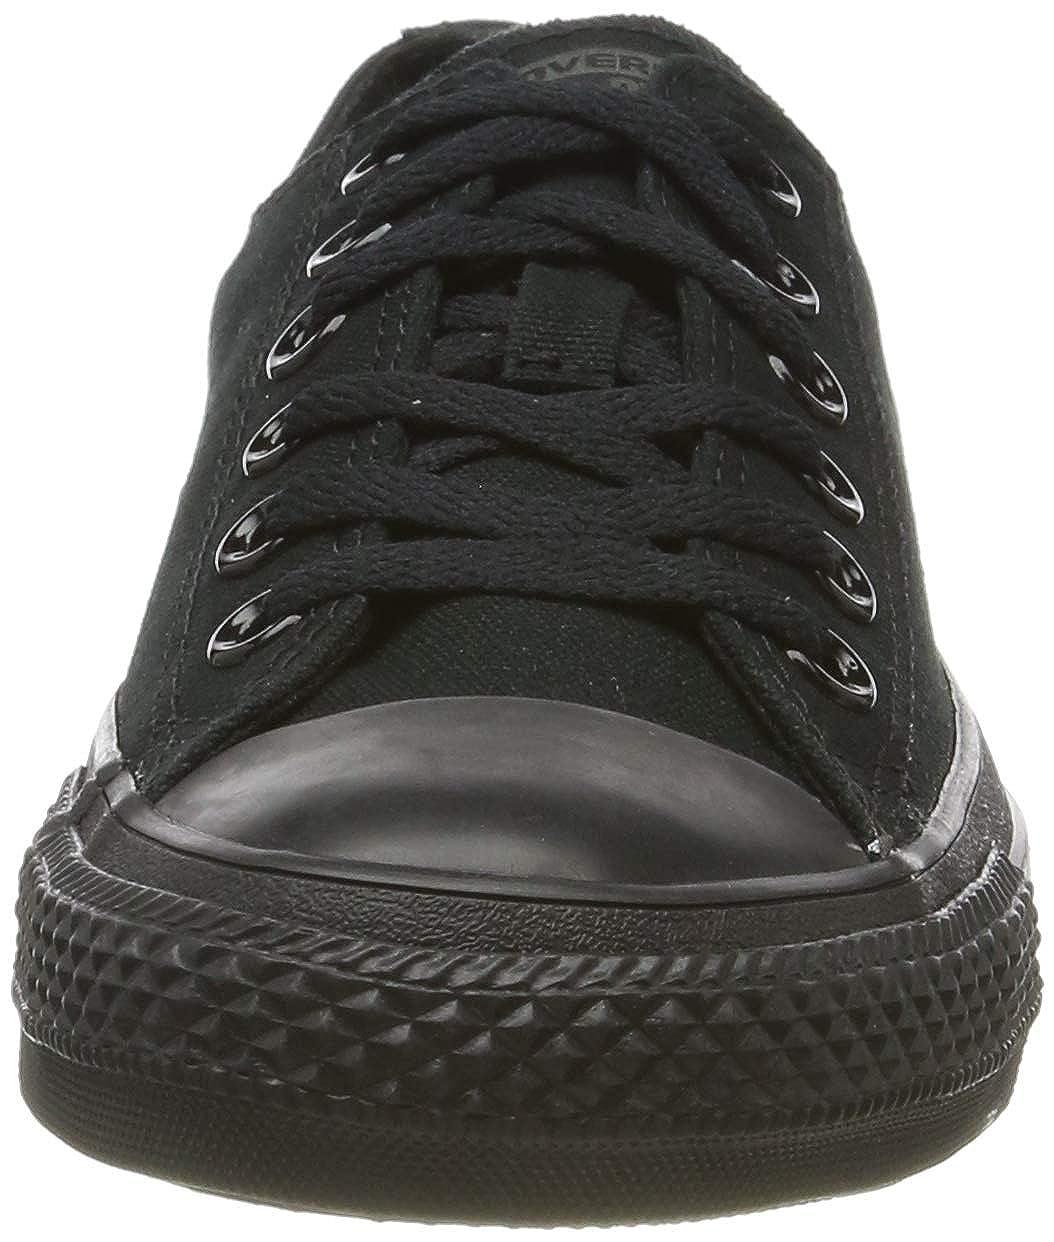 9c943b6baf75f Converse - 15490 - Chuck Taylor All Star Mono Ox - Baskets Basses - Mixte  Adulte  Amazon.fr  Chaussures et Sacs